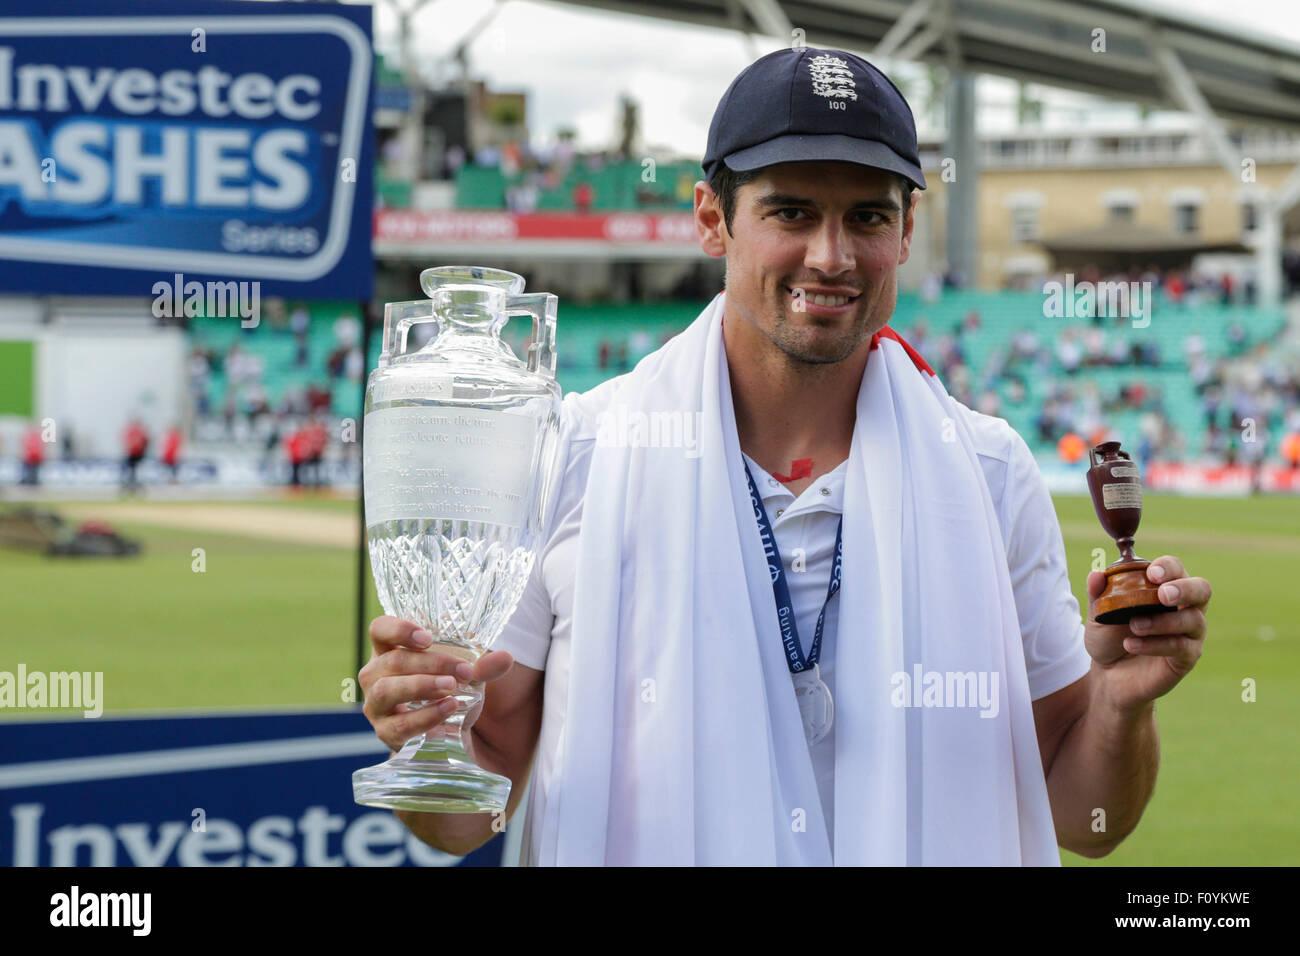 London, UK. 23. August 2015. Investec Asche 5. Test, Tag 4. England gegen Australien. Englands Alastair Cook Posen Stockbild